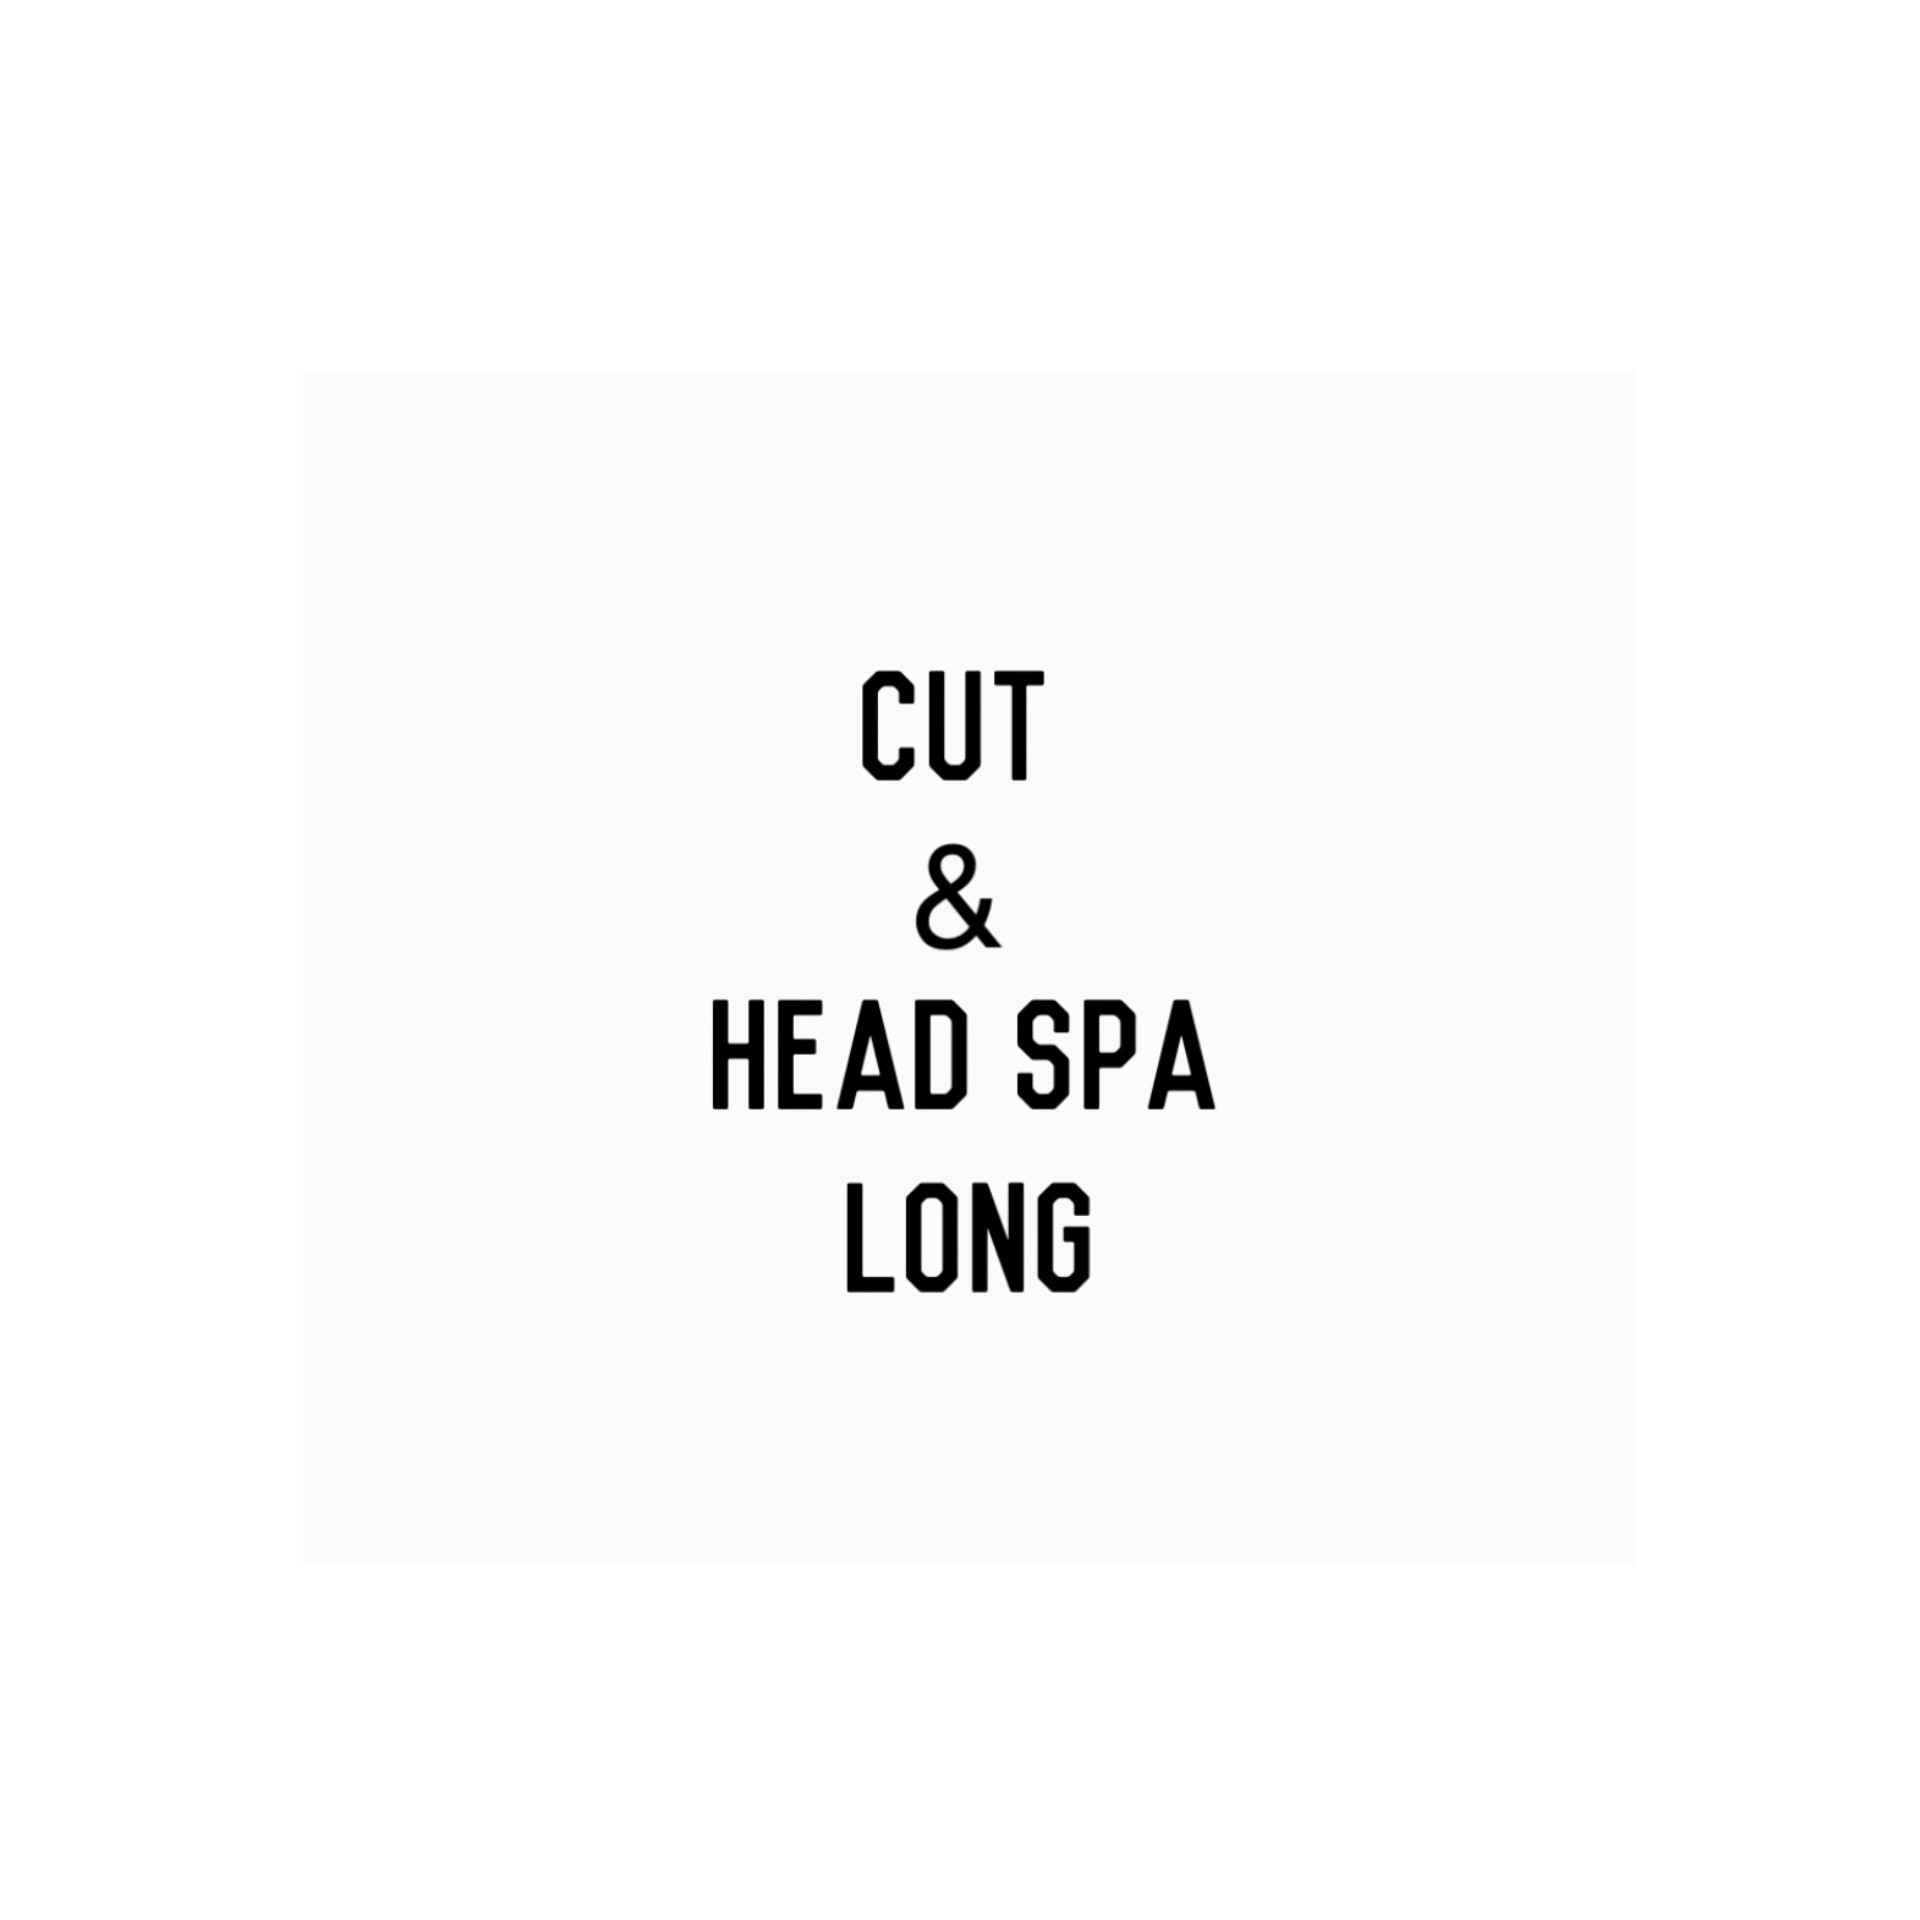 Cut & Head Spa (LONG)